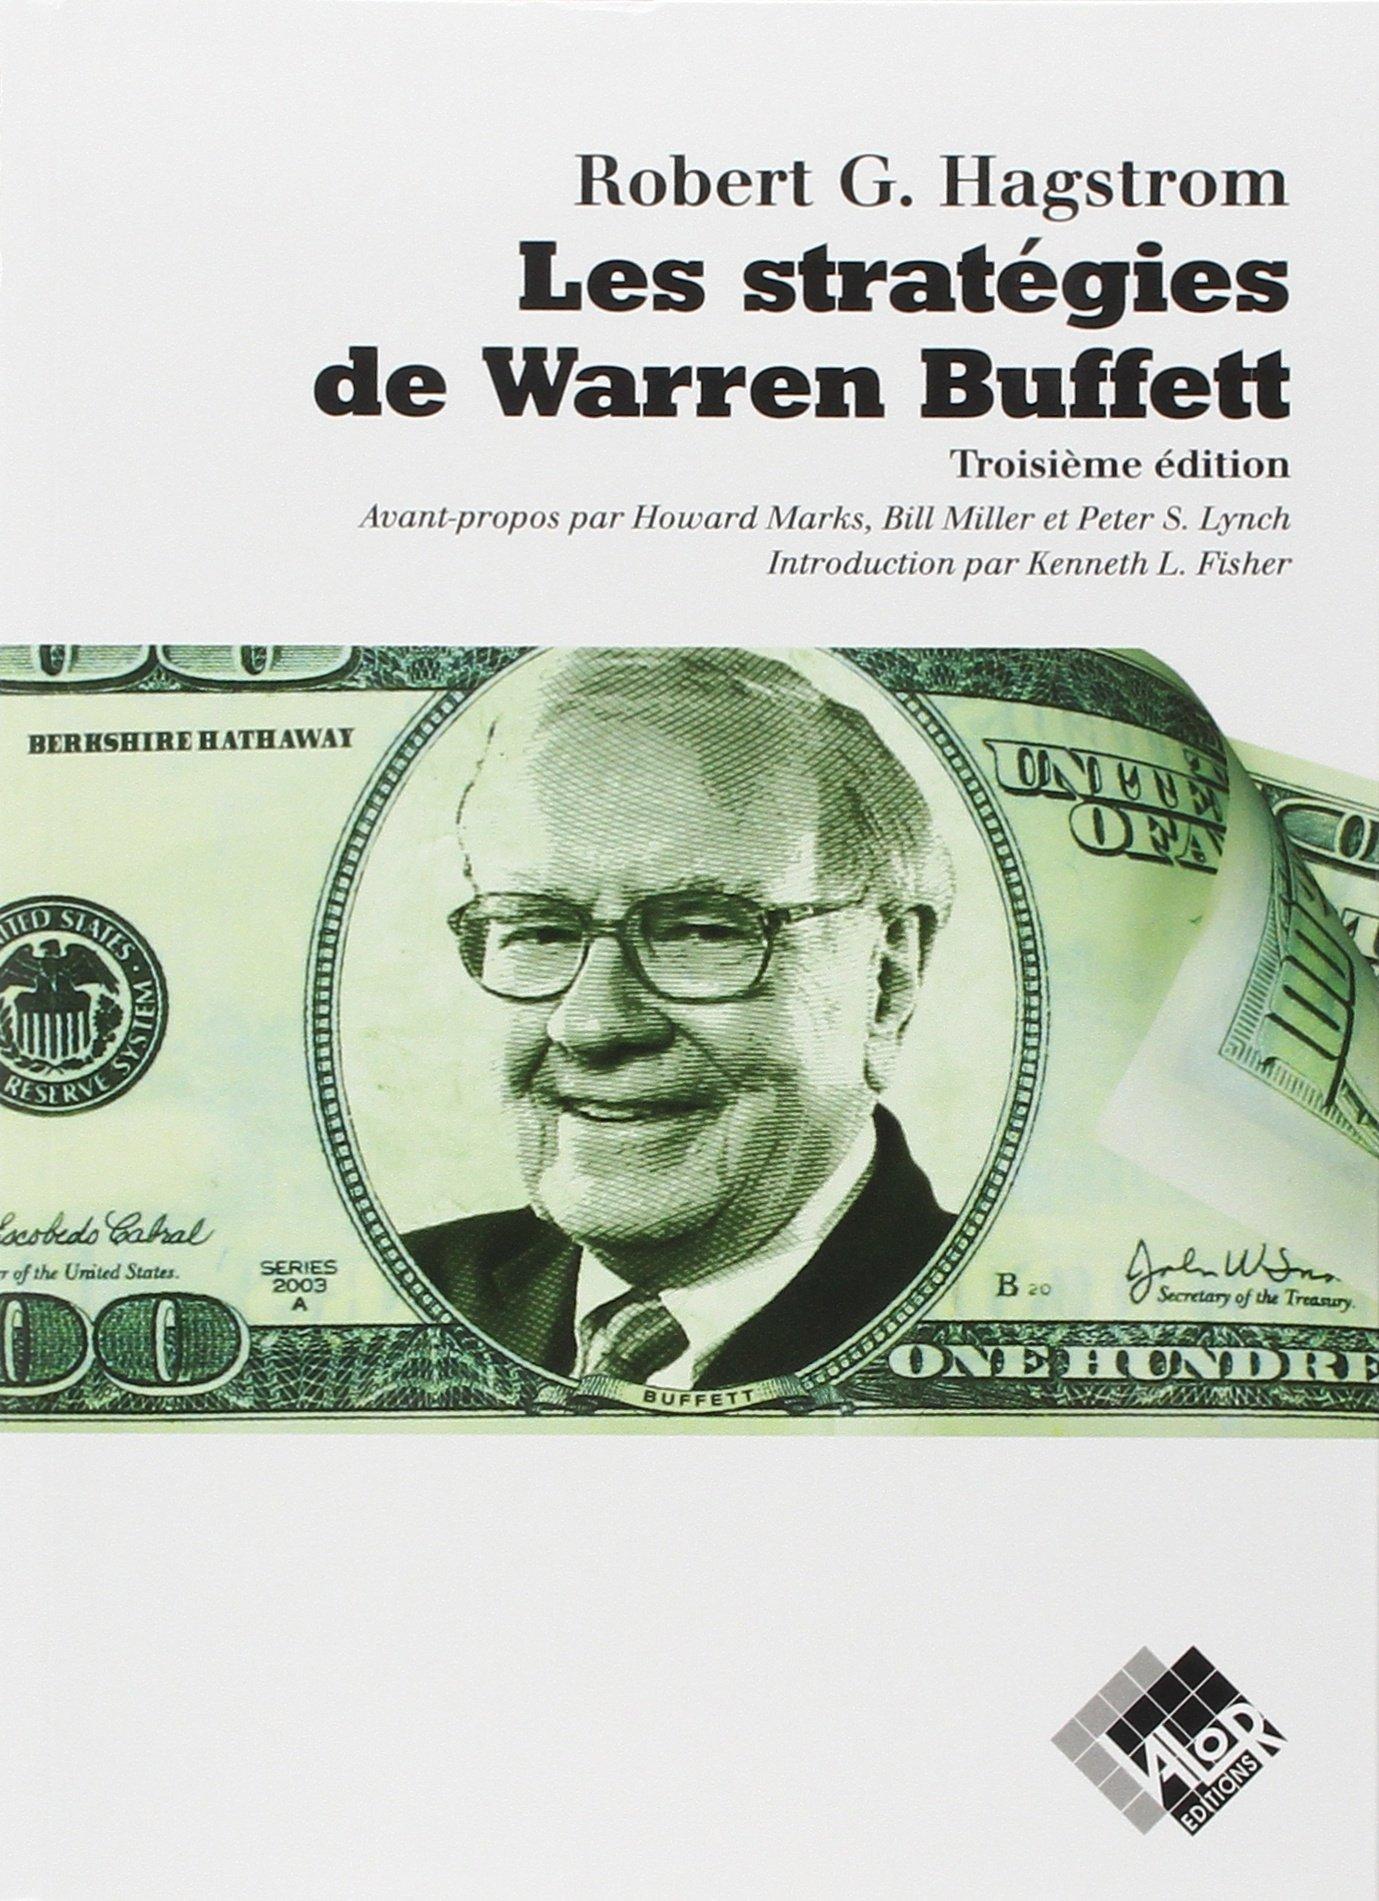 Les stratégies de Warren Buffett: 3ème édition. Broché – 1 janvier 2015 Robert G. Hagstrom Valor 2361170167 Bourse